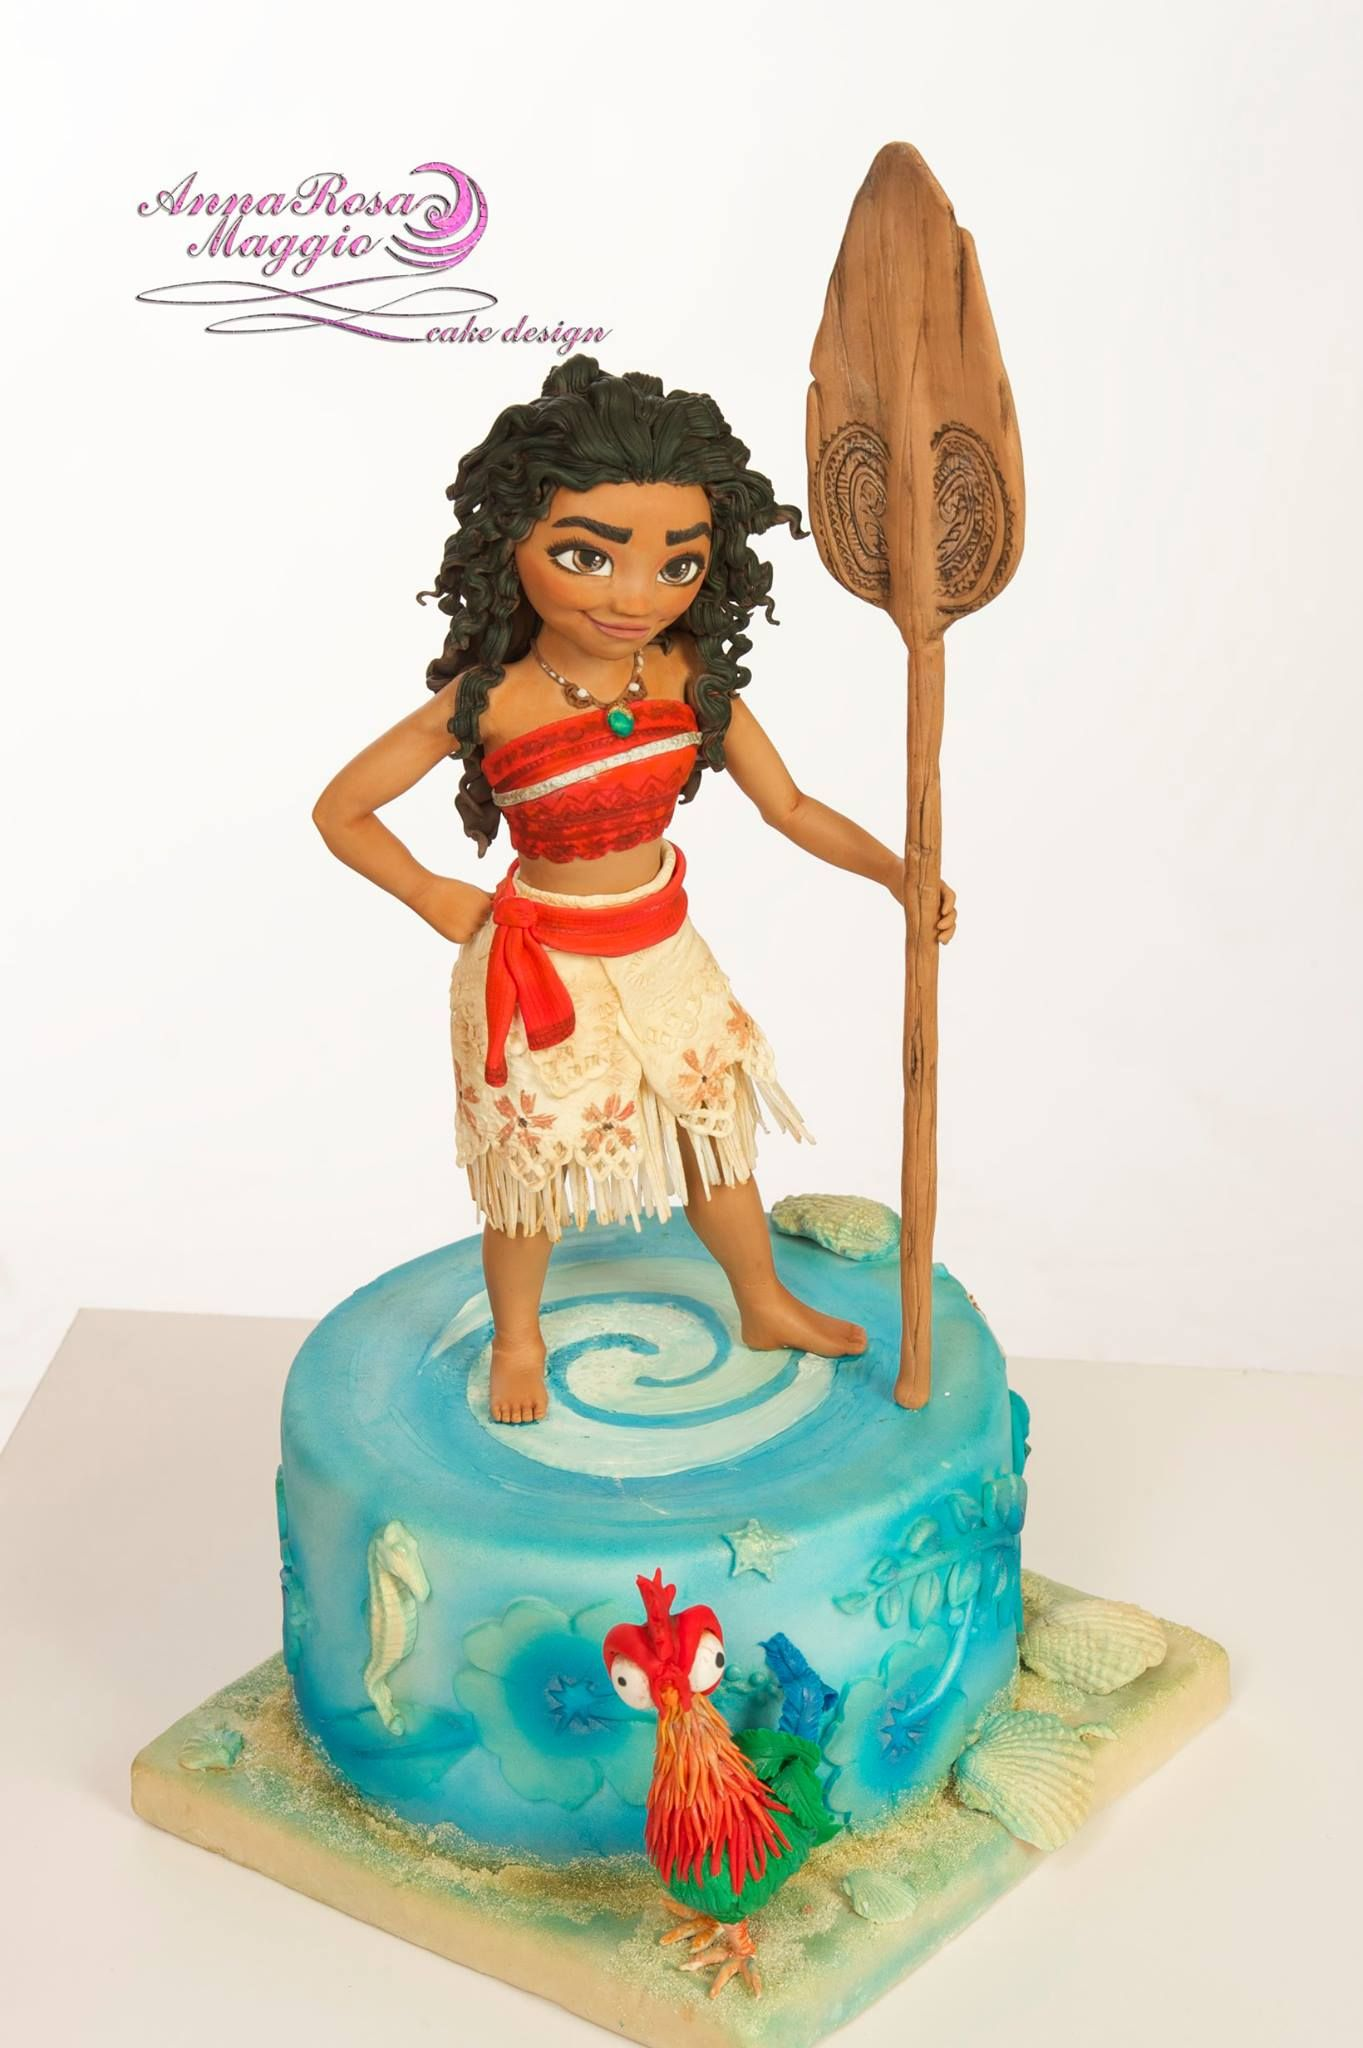 anna rosa maggio cakes disney pinterest moana cake and cake designs. Black Bedroom Furniture Sets. Home Design Ideas